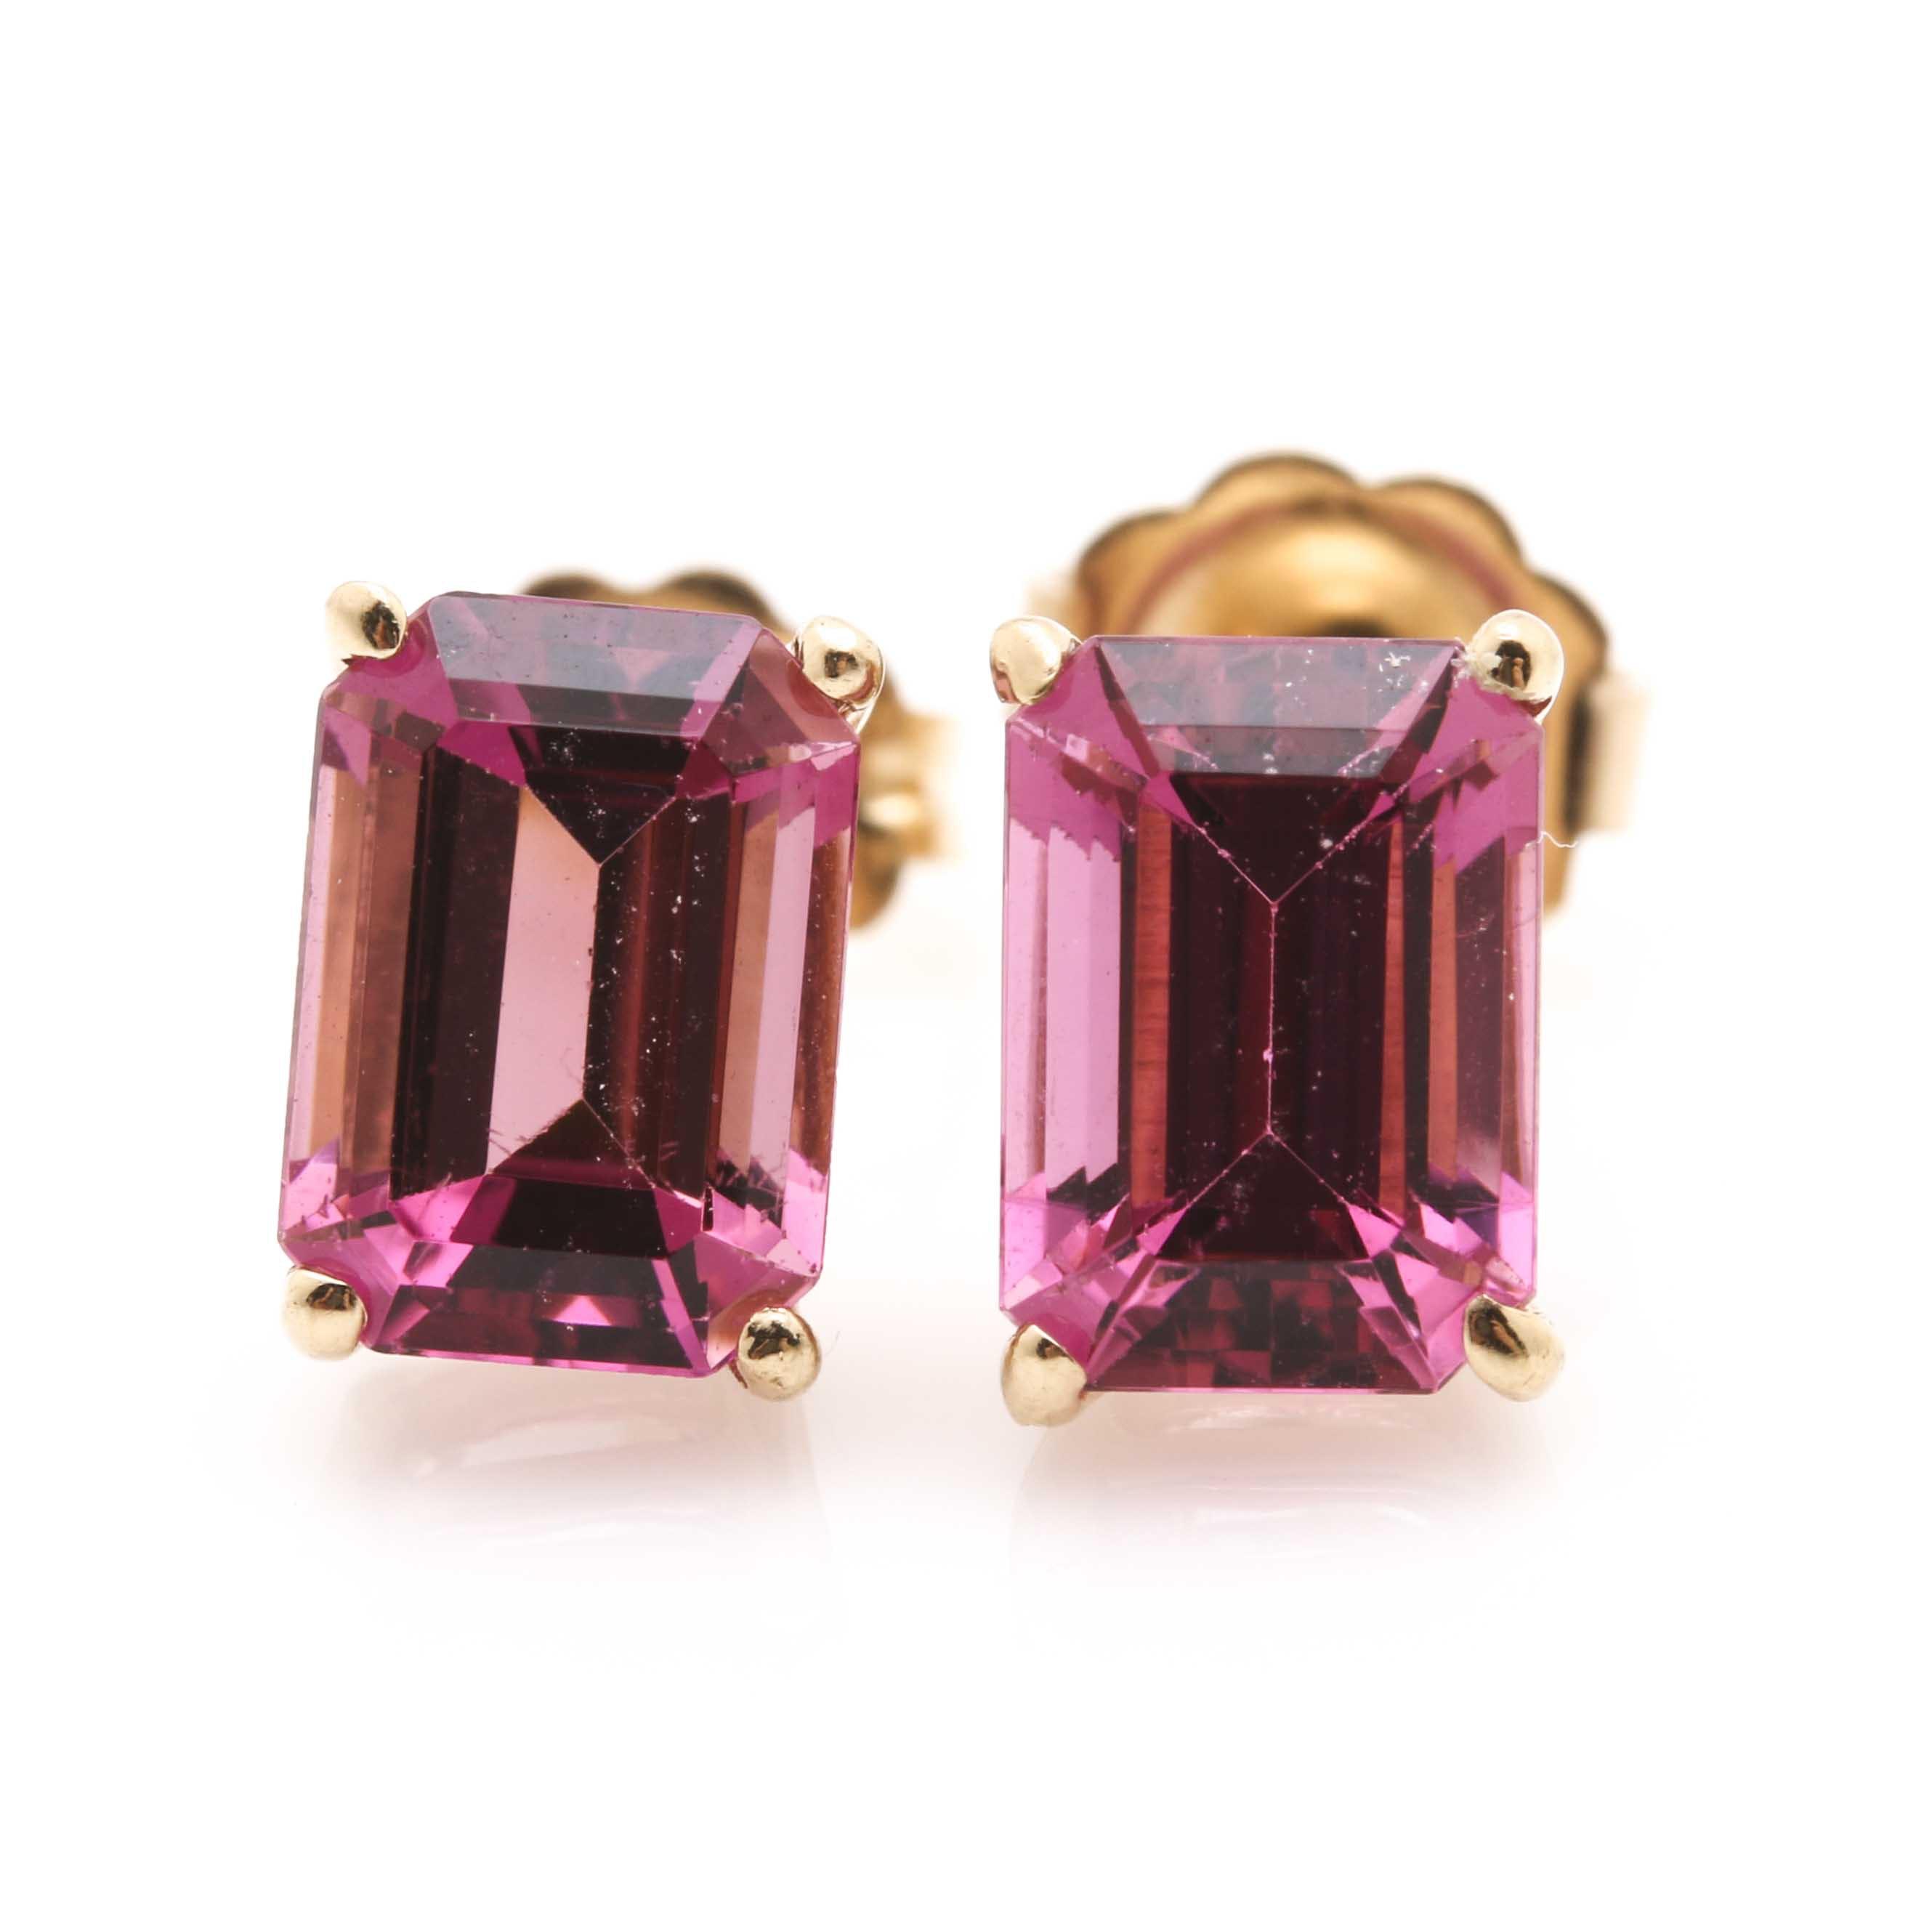 14K Yellow Gold Pink Tourmaline Earrings